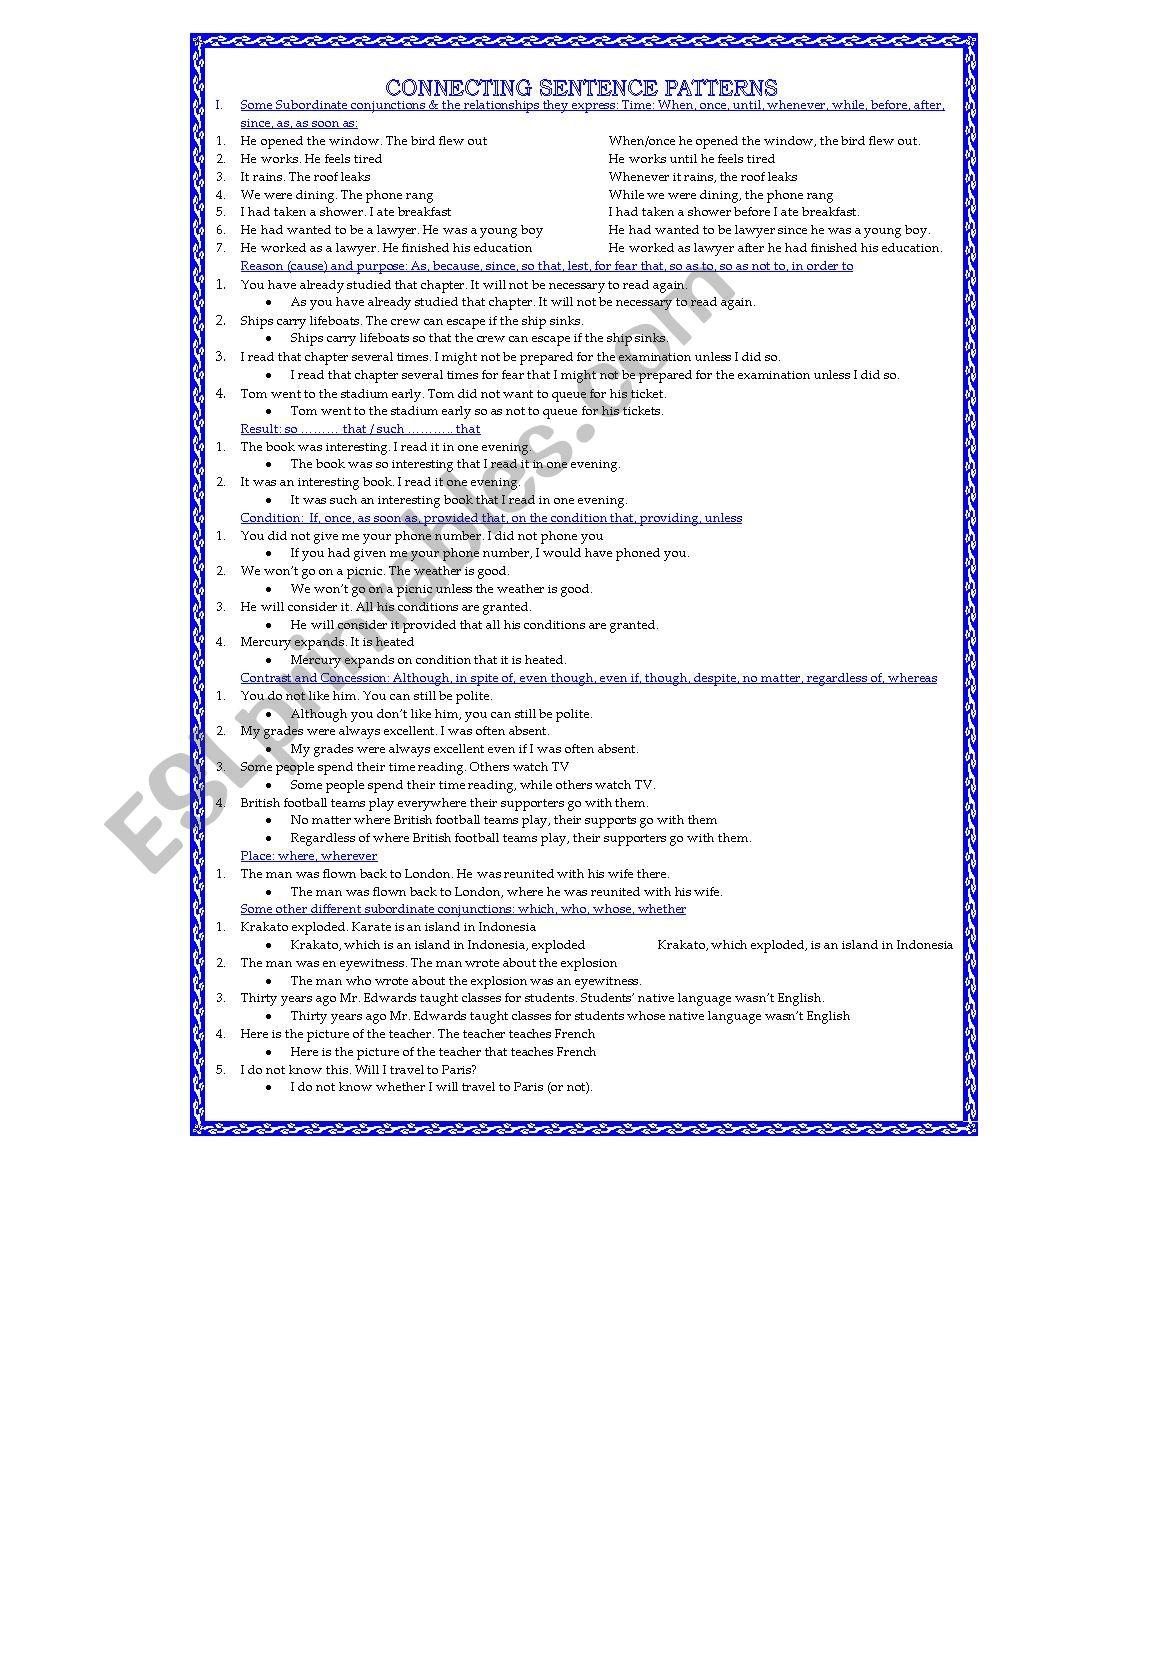 Connecting Sentence Patterns Subordination Amp Coordination